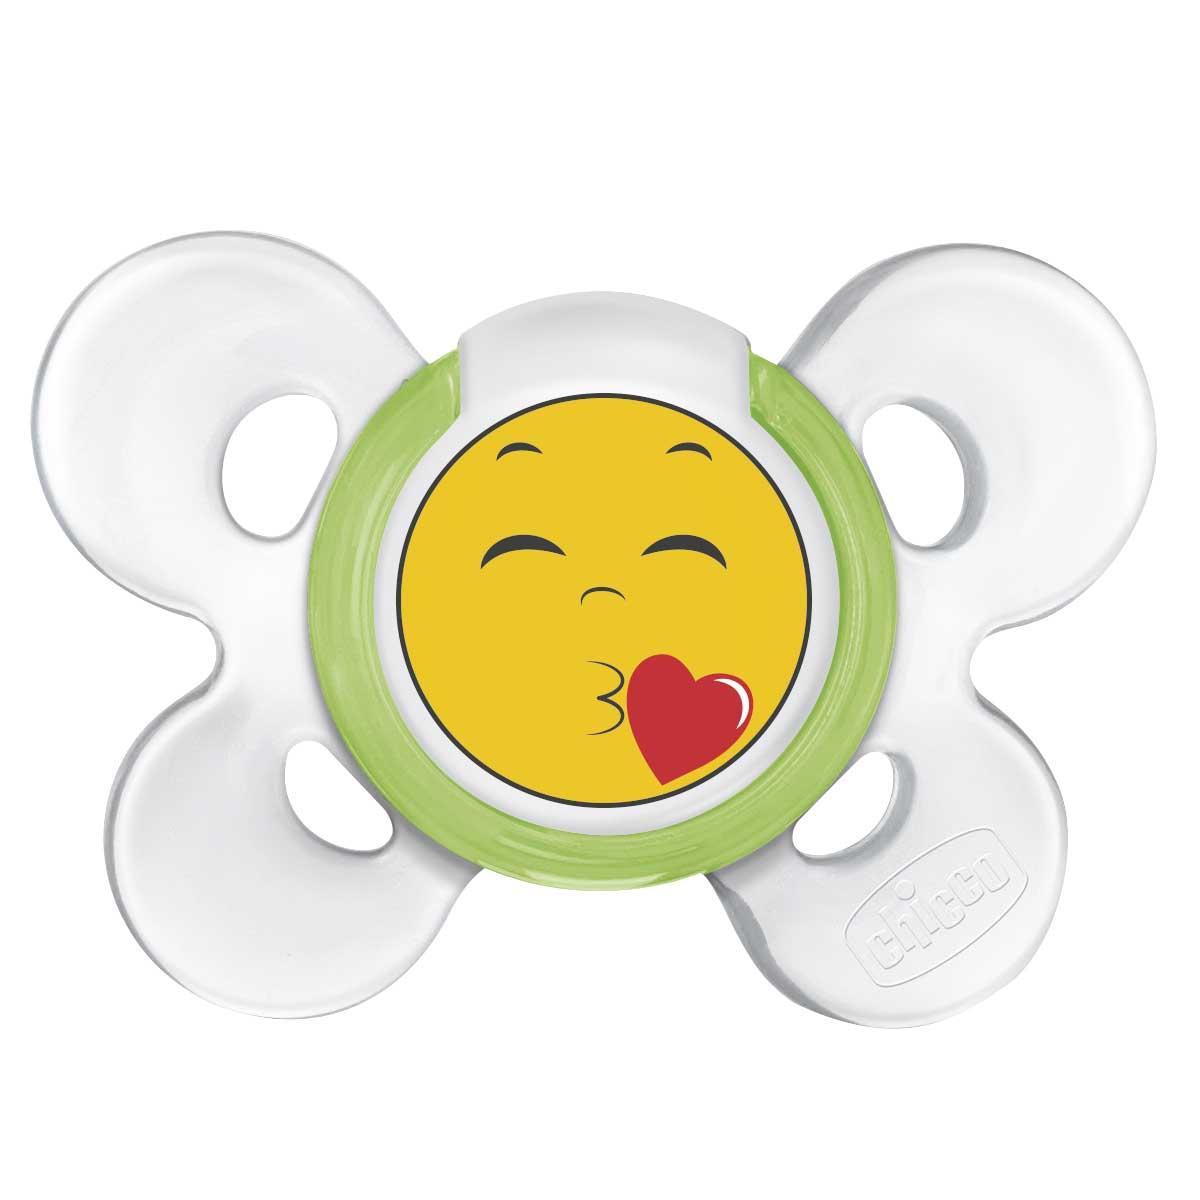 Купить Пустышка Physio Comfort Smile, 1 шт., 6-12 мес., силикон, Chicco